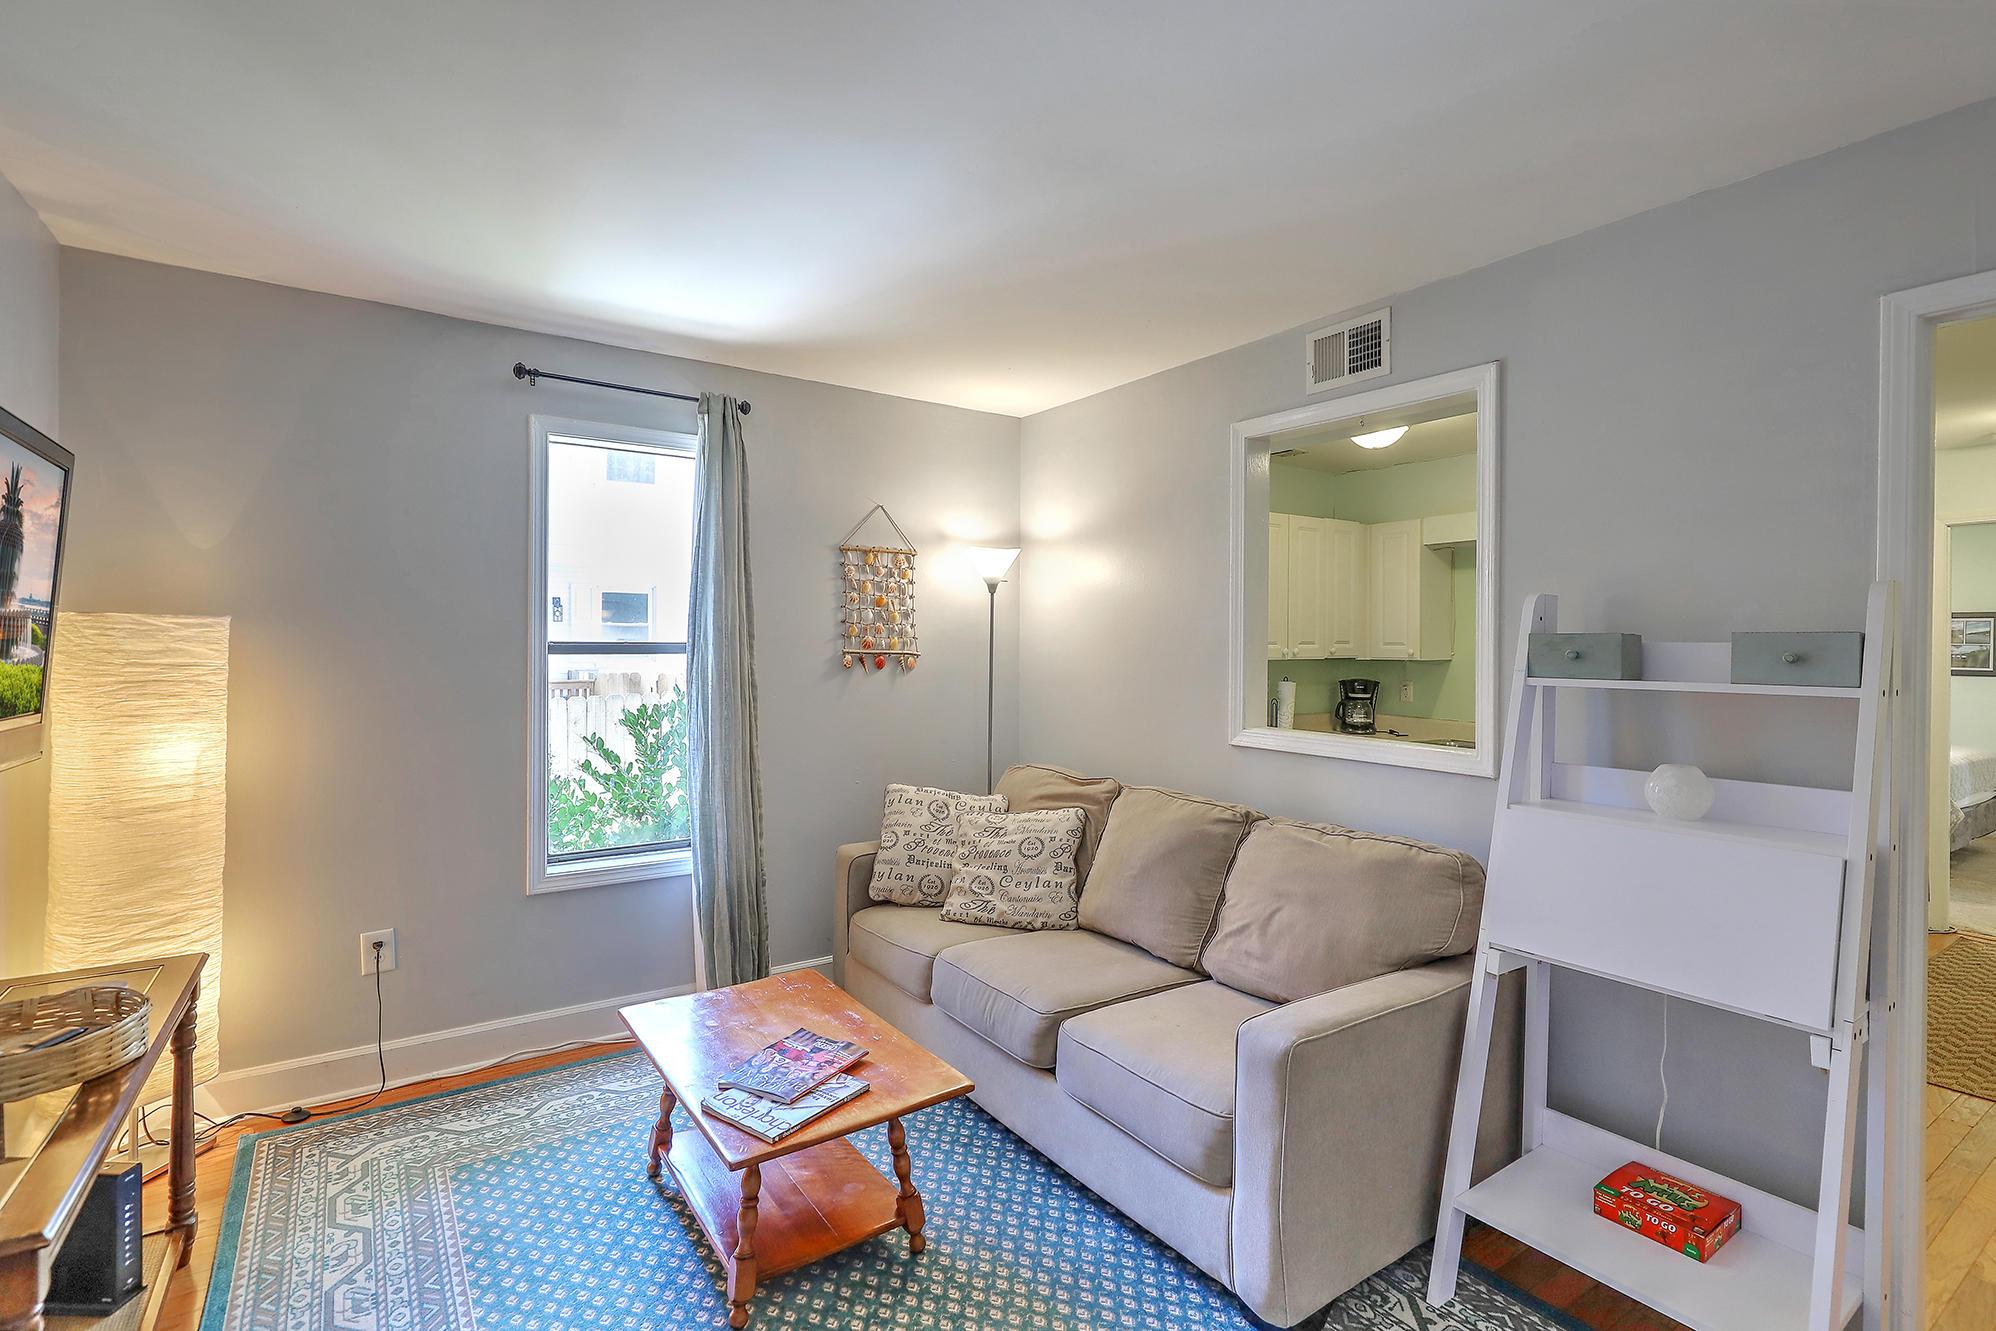 Marsh Grass Condominiums Homes For Sale - 1501 Ben Sawyer, Mount Pleasant, SC - 17